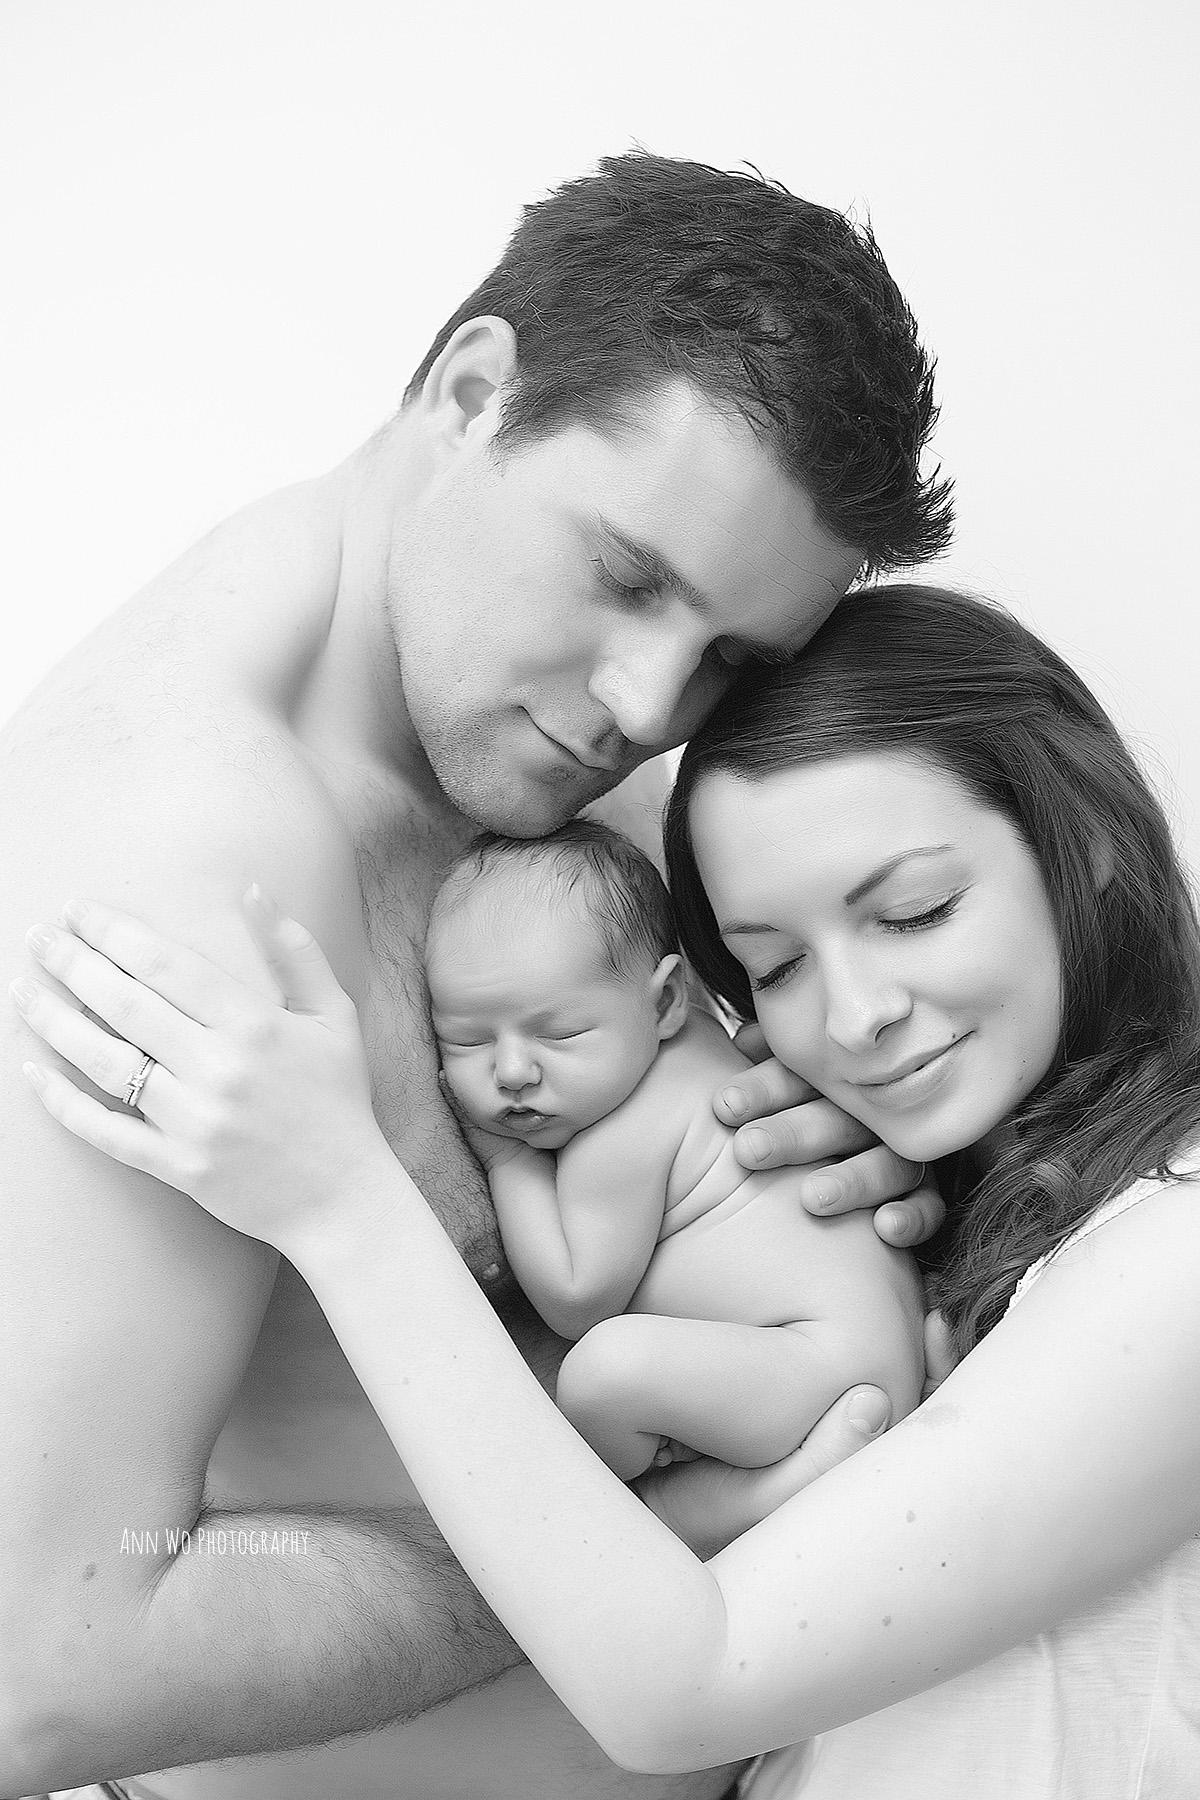 ann-wo-photography-newborn-enfield019.jpg